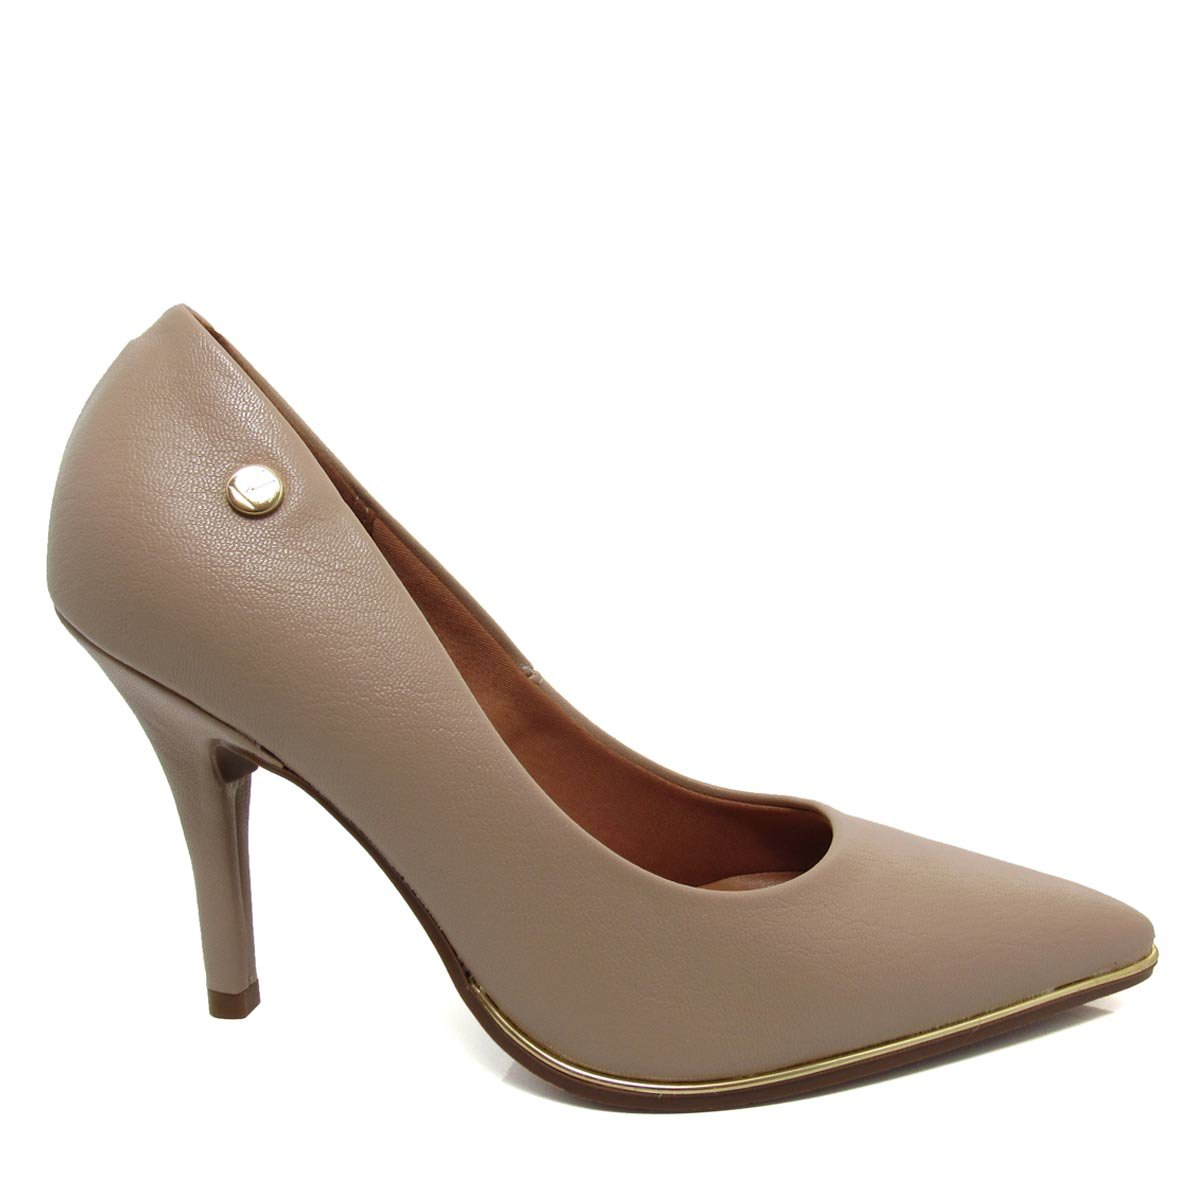 404380d5ef Sapato Scarpin Feminino Vizzano Bico fino 1267100 Coleção 2018